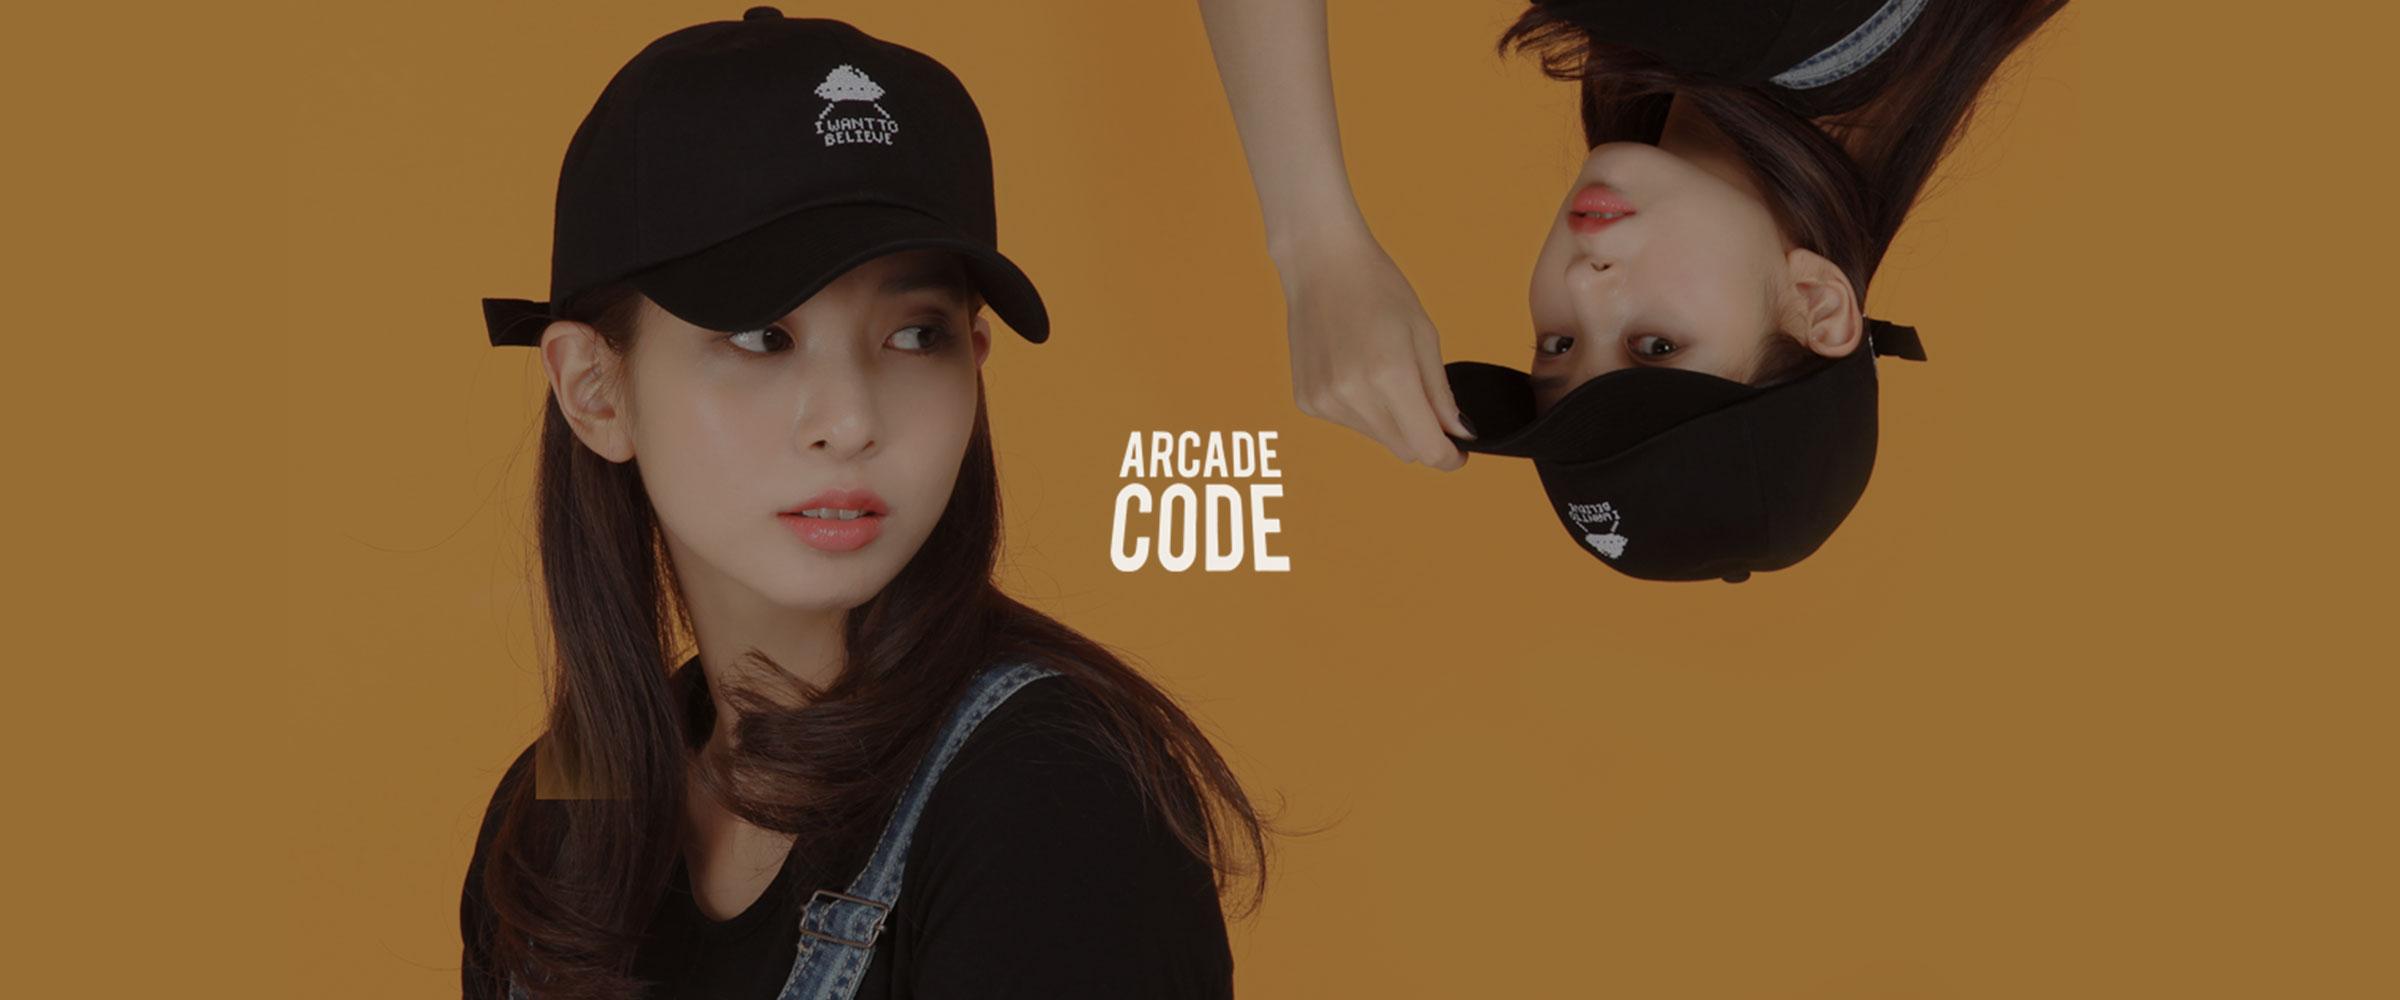 arcadecode.jpg